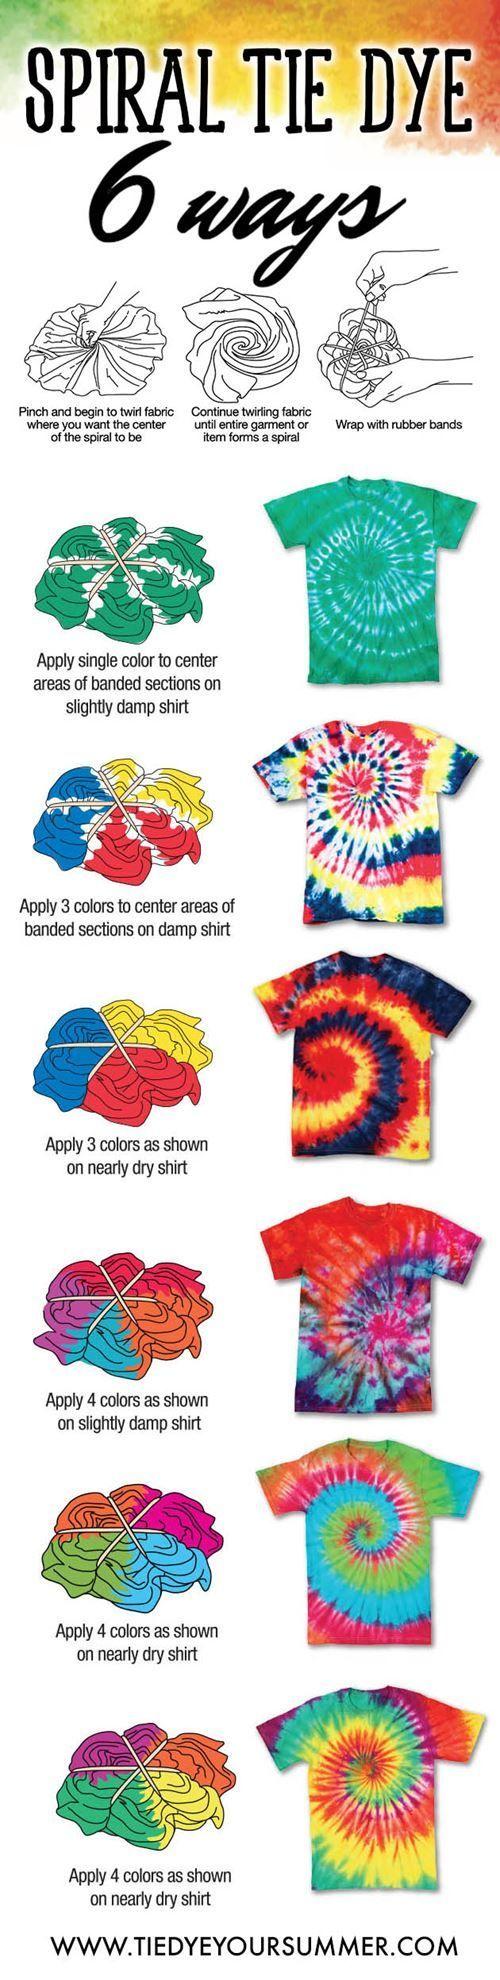 tie dye pattern instructions photo - 1